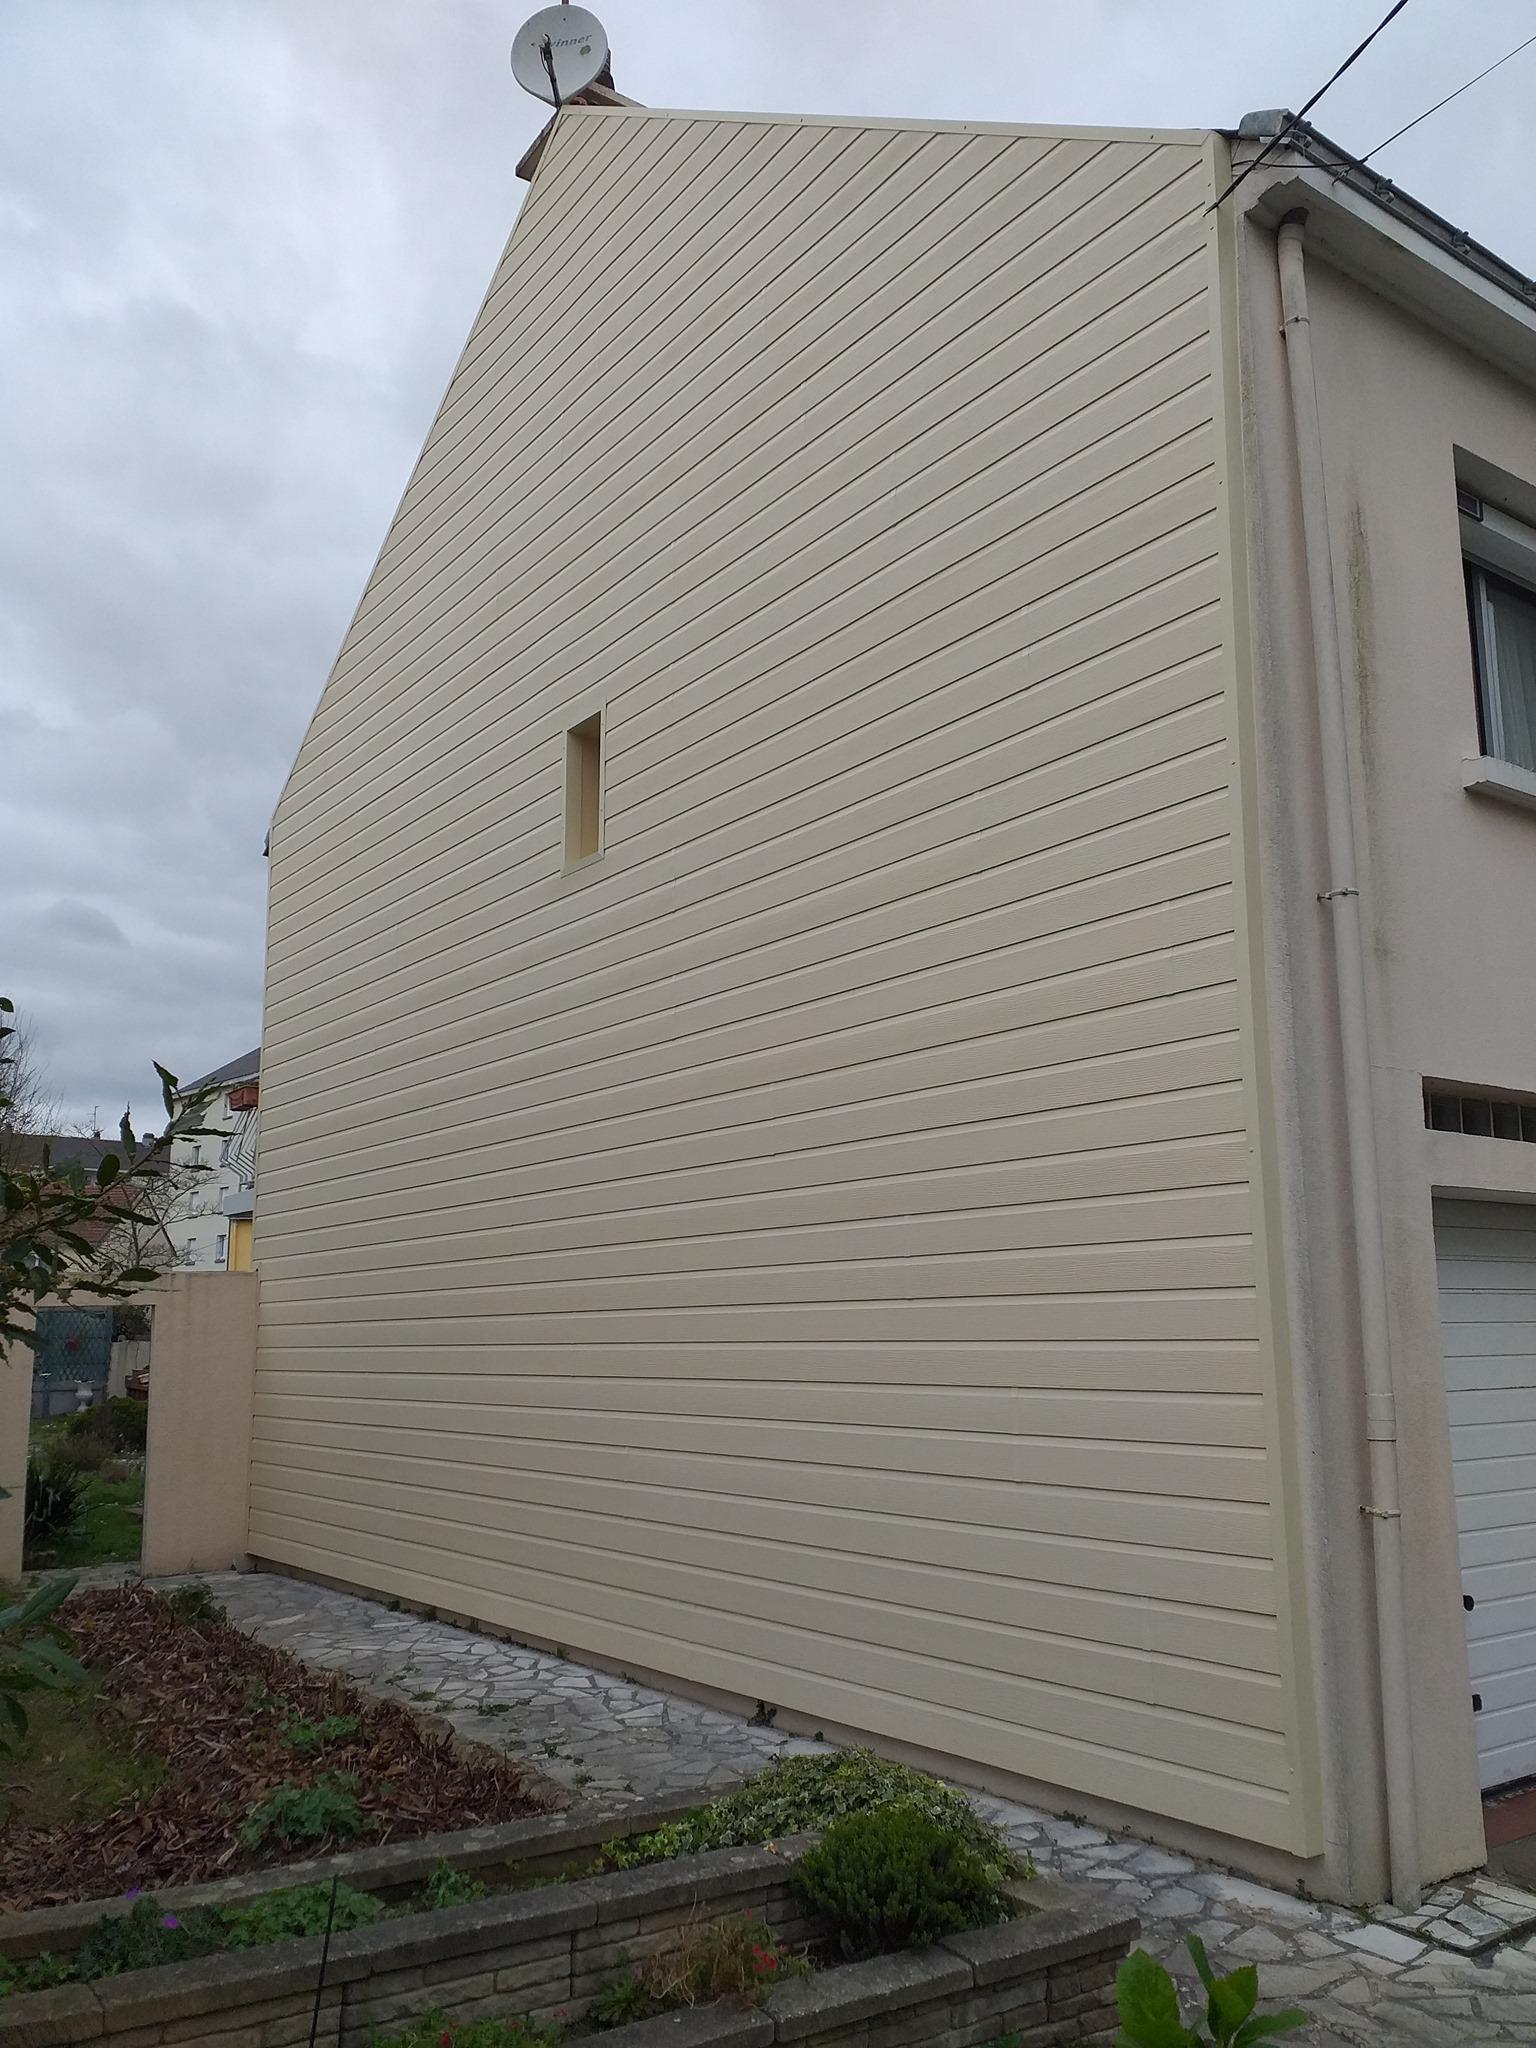 01 Rénovation-de-facade-pose-de-bardage